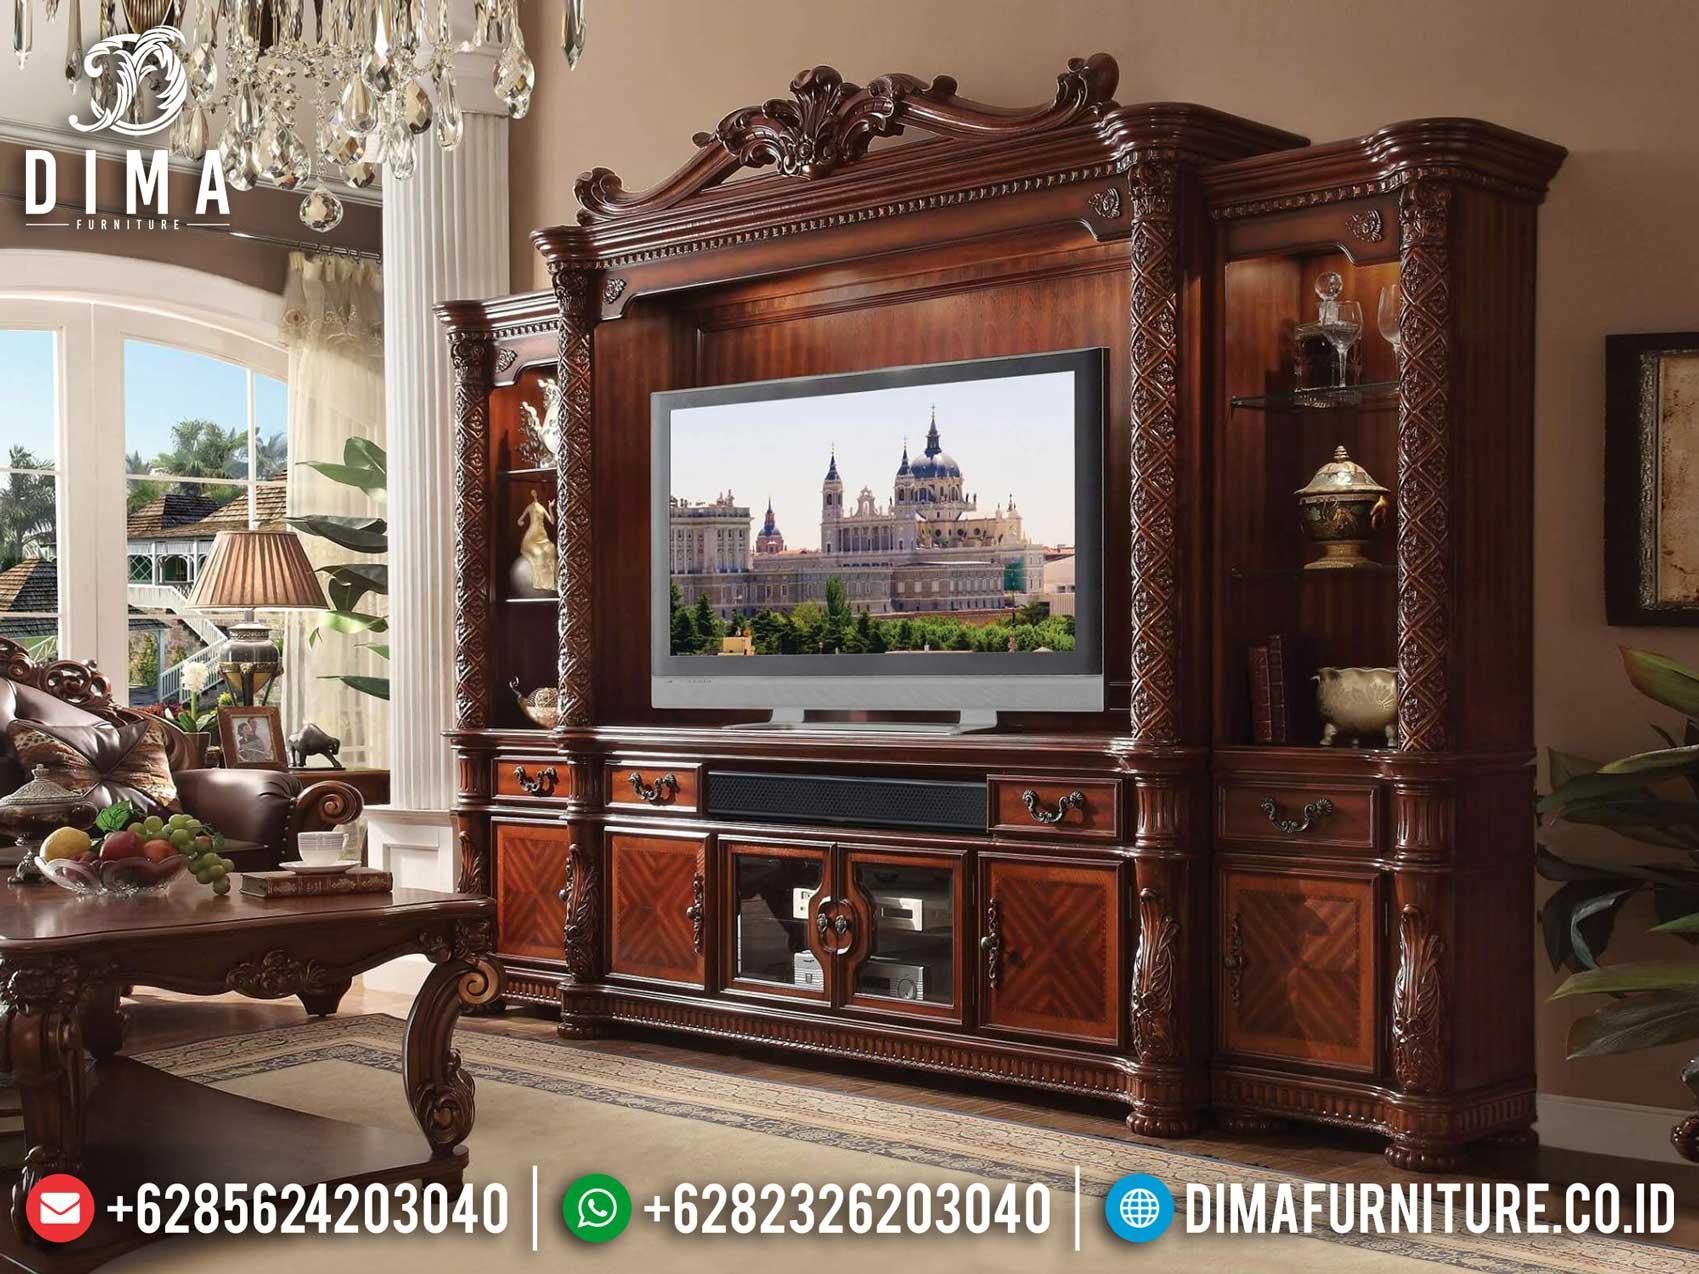 Bufet TV Mewah Kayu Jati Natural Salak Brown Luxury Carving Jepara MM-0780